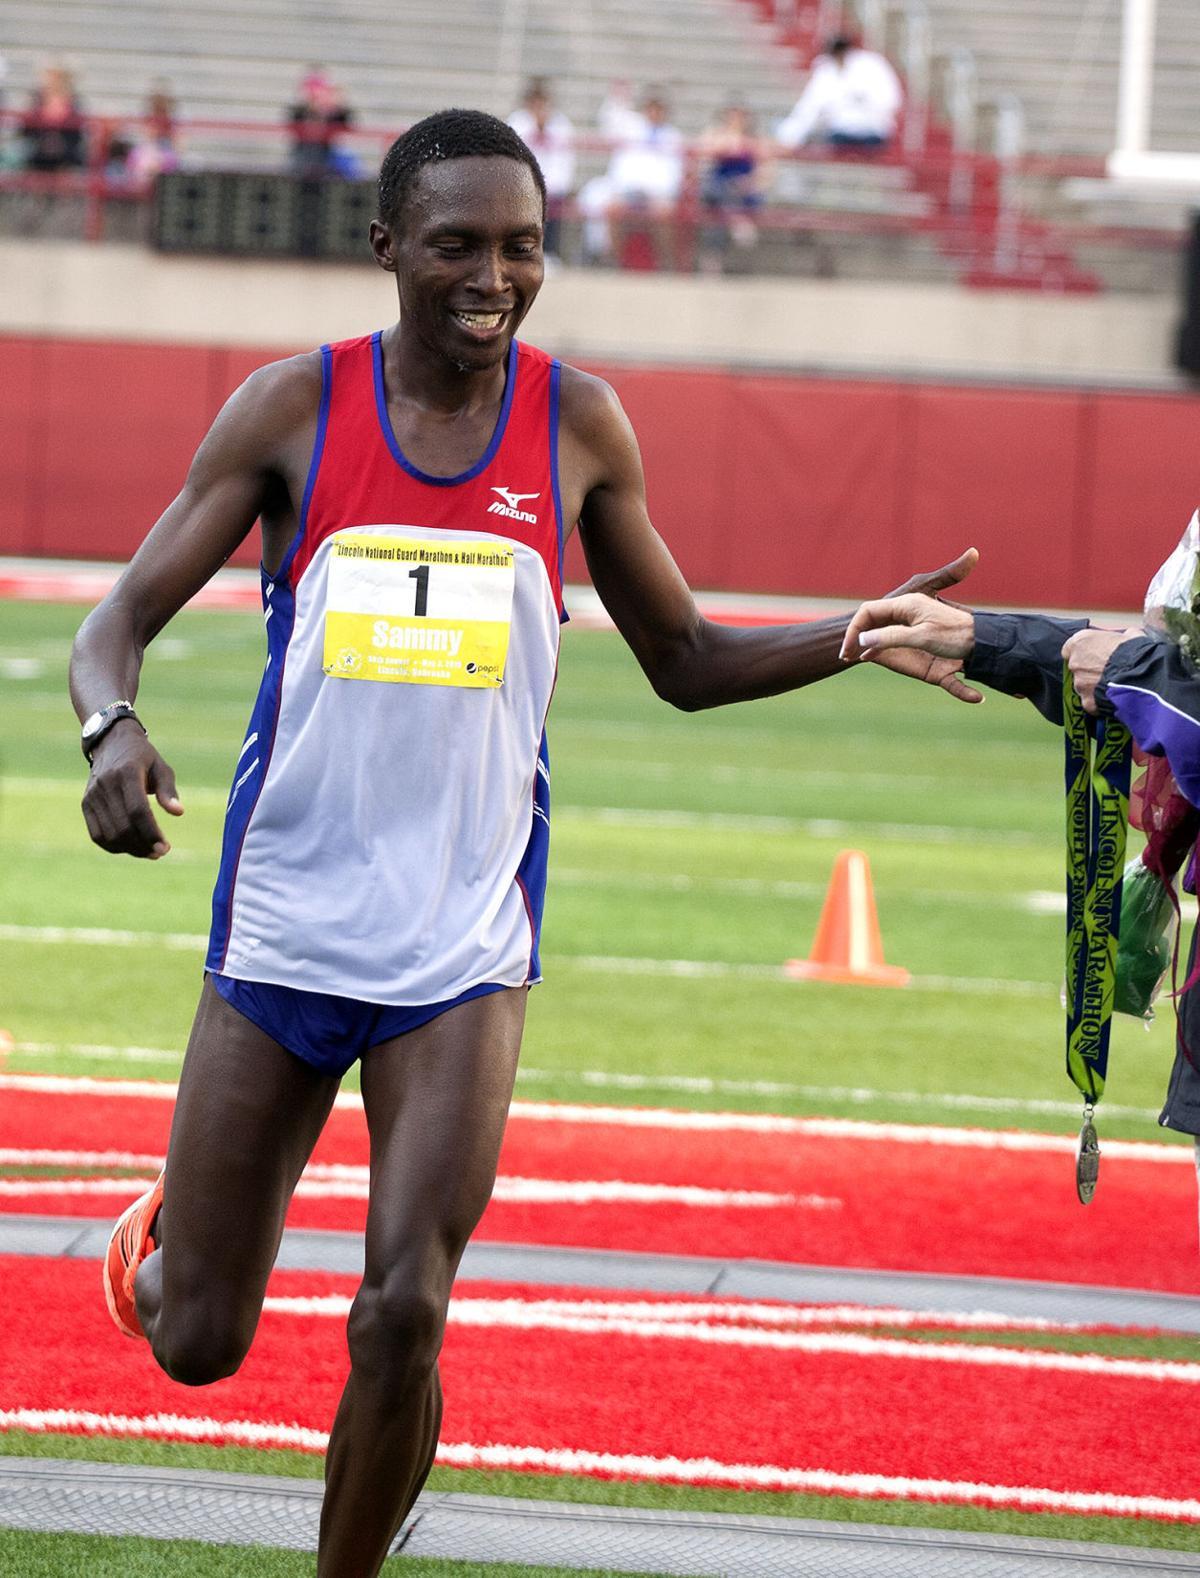 Lincoln Marathon, 5.3.2015